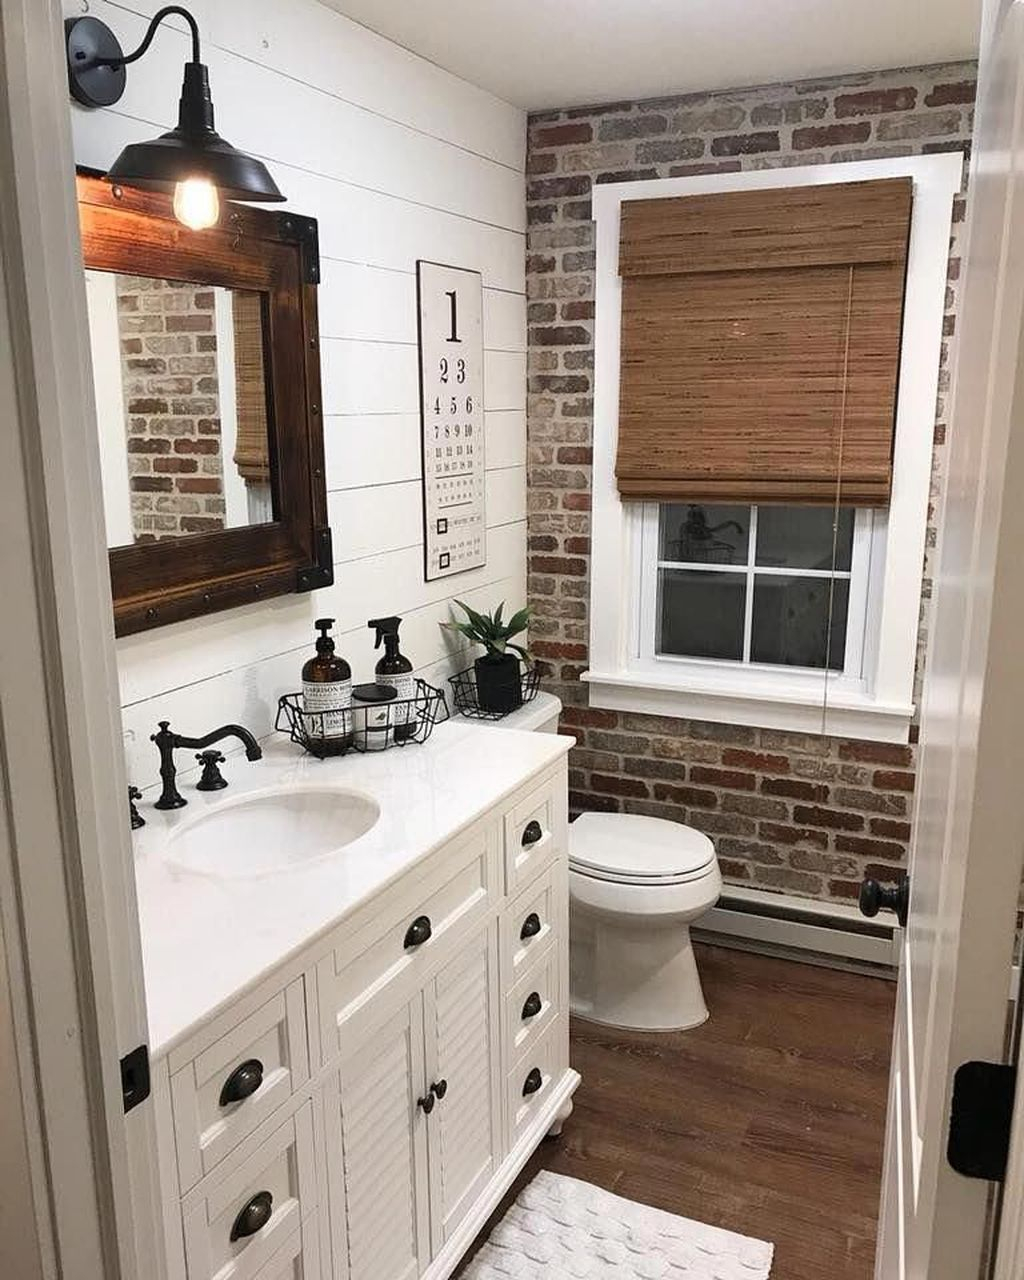 Unusual Bathroom Design Ideas You Need To Know 01